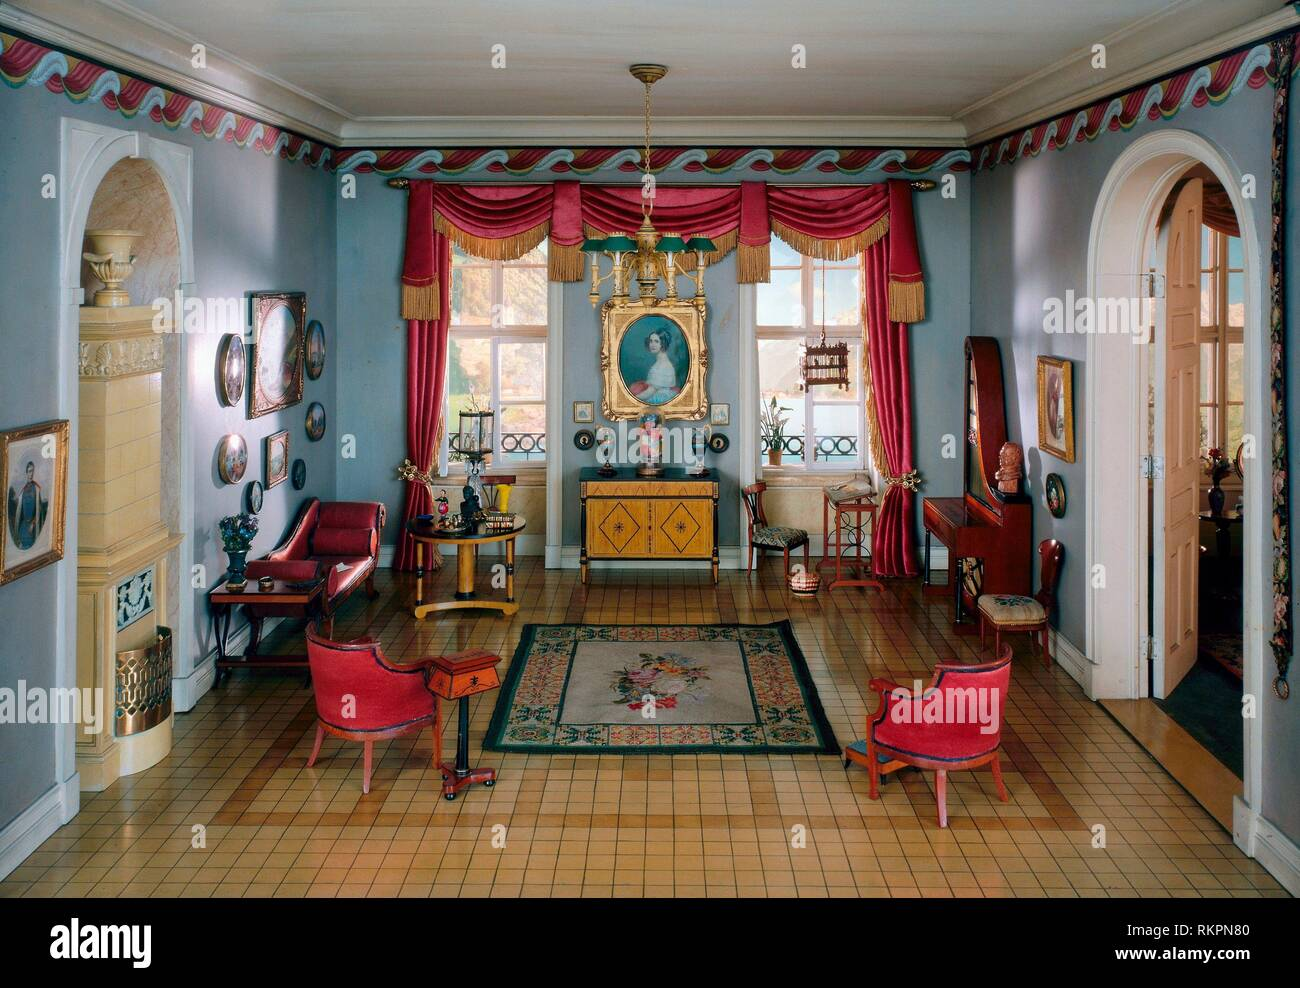 German Biedermeier Fotos e Imágenes de stock - Alamy